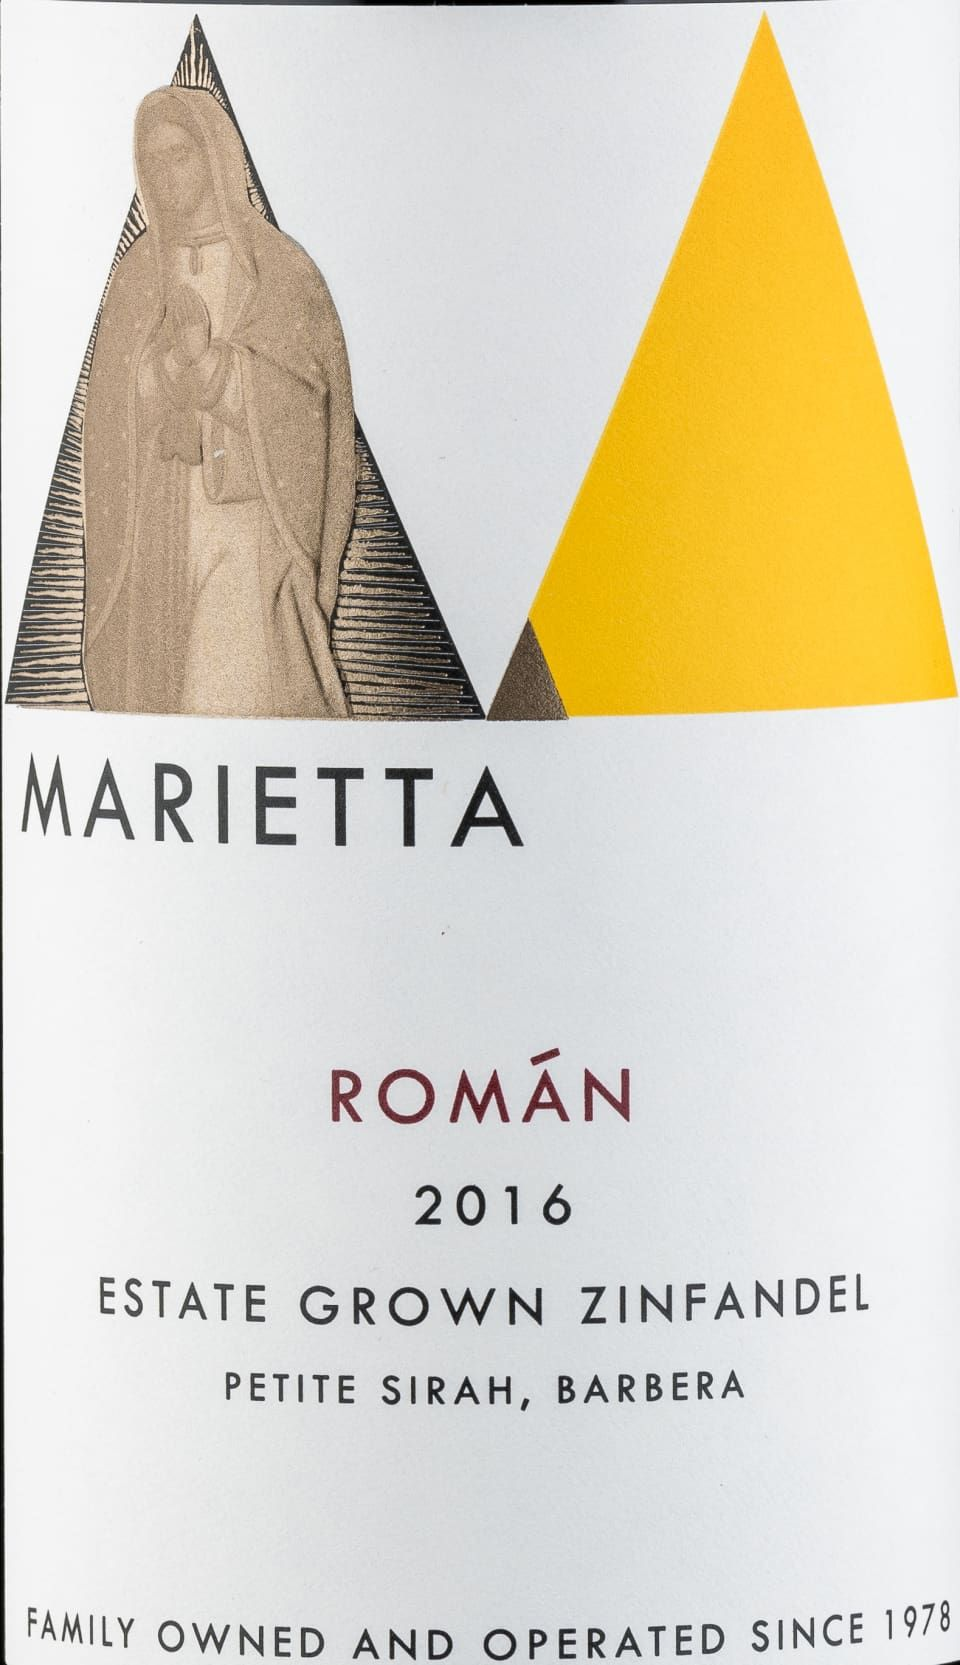 Marietta Roman Estate Zinfandel 2016 Zinfandel Petite Sirah Alcoholic Drinks